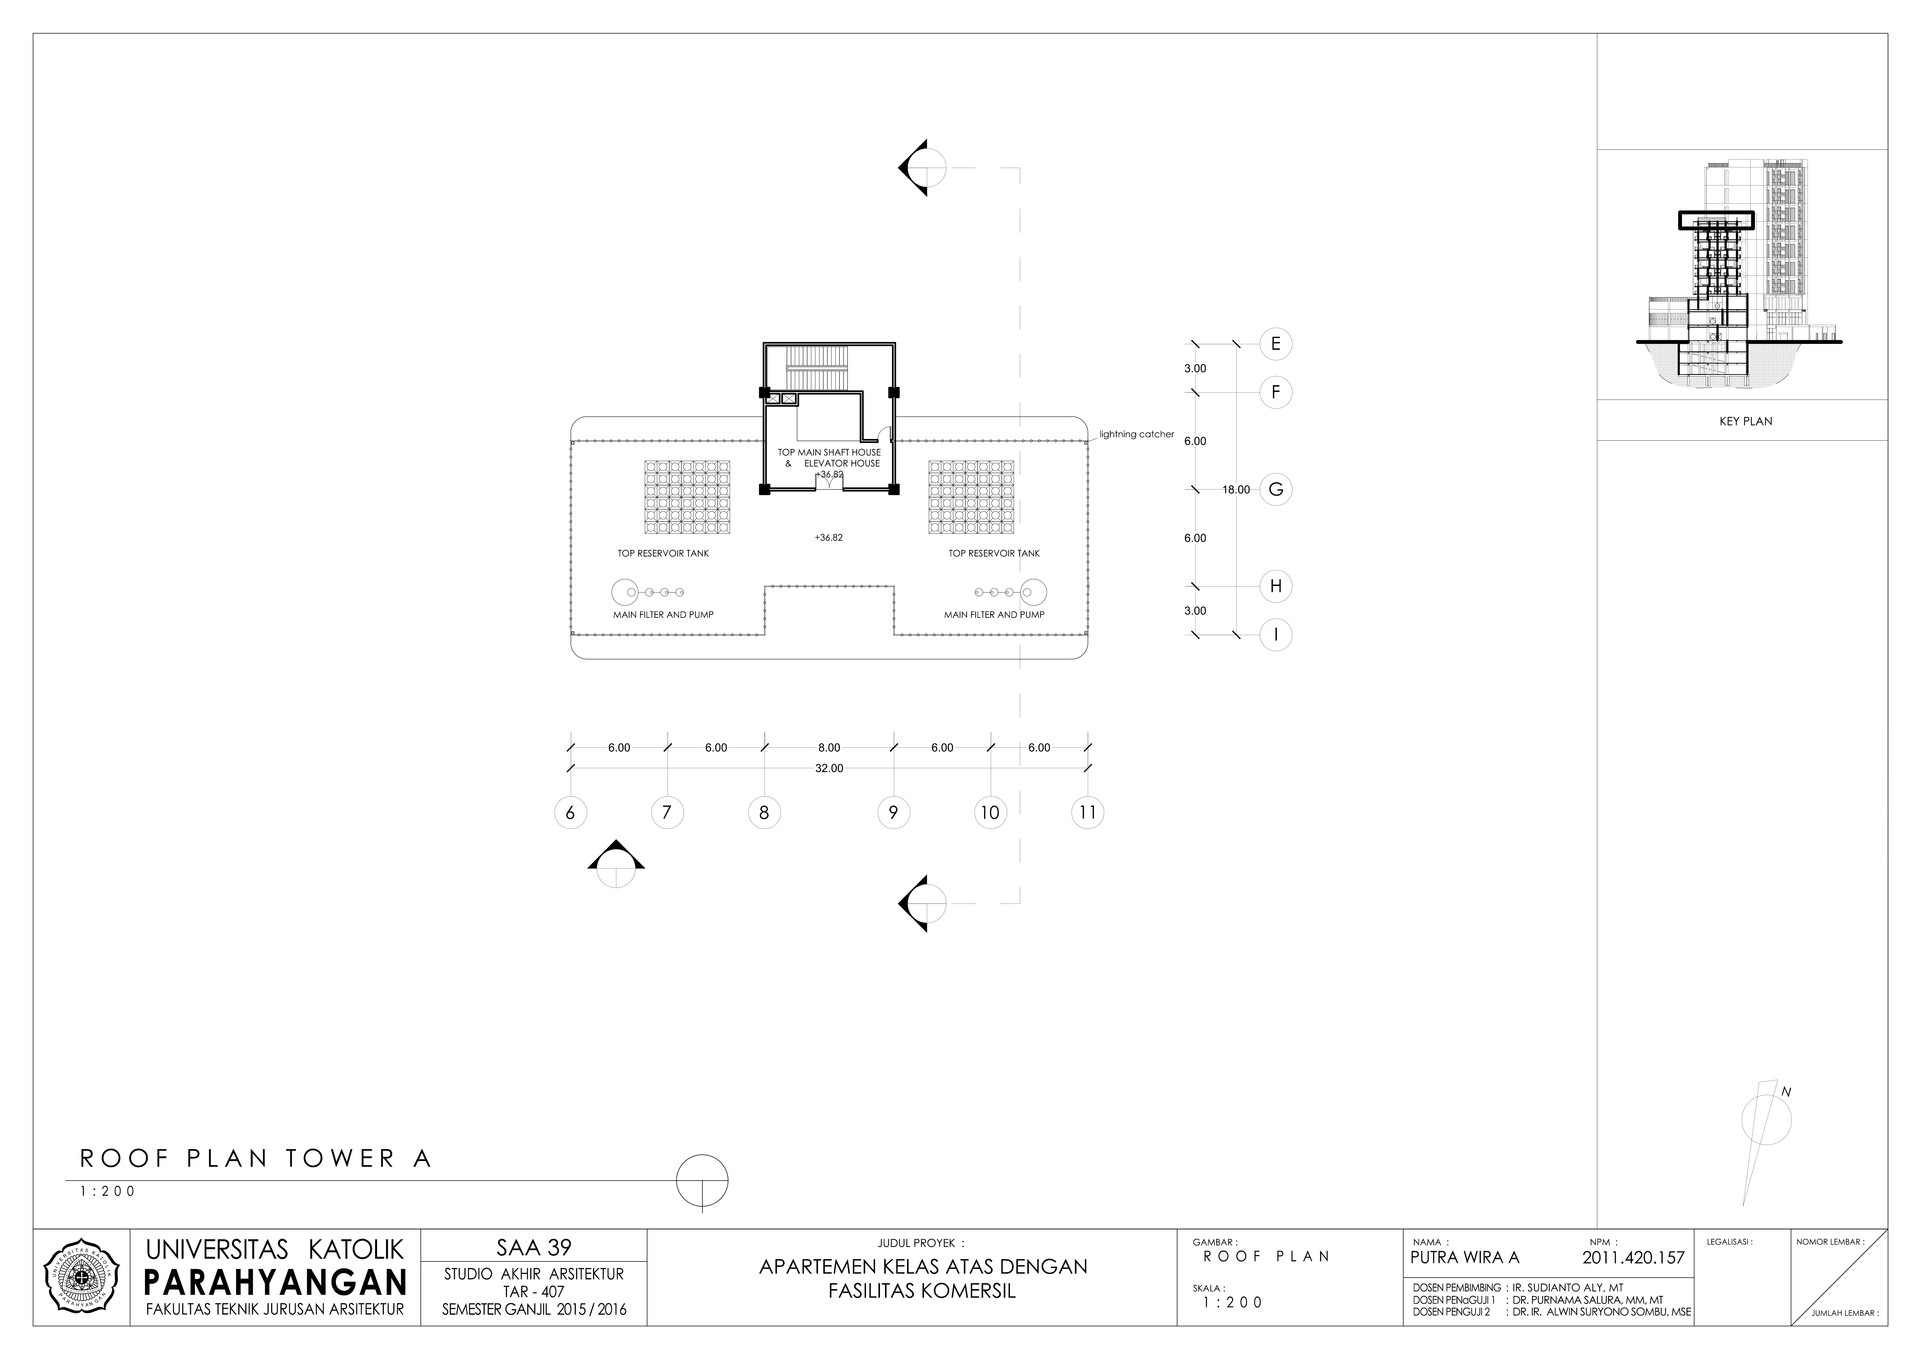 Putra wira adhiprajna 4 roof floor a